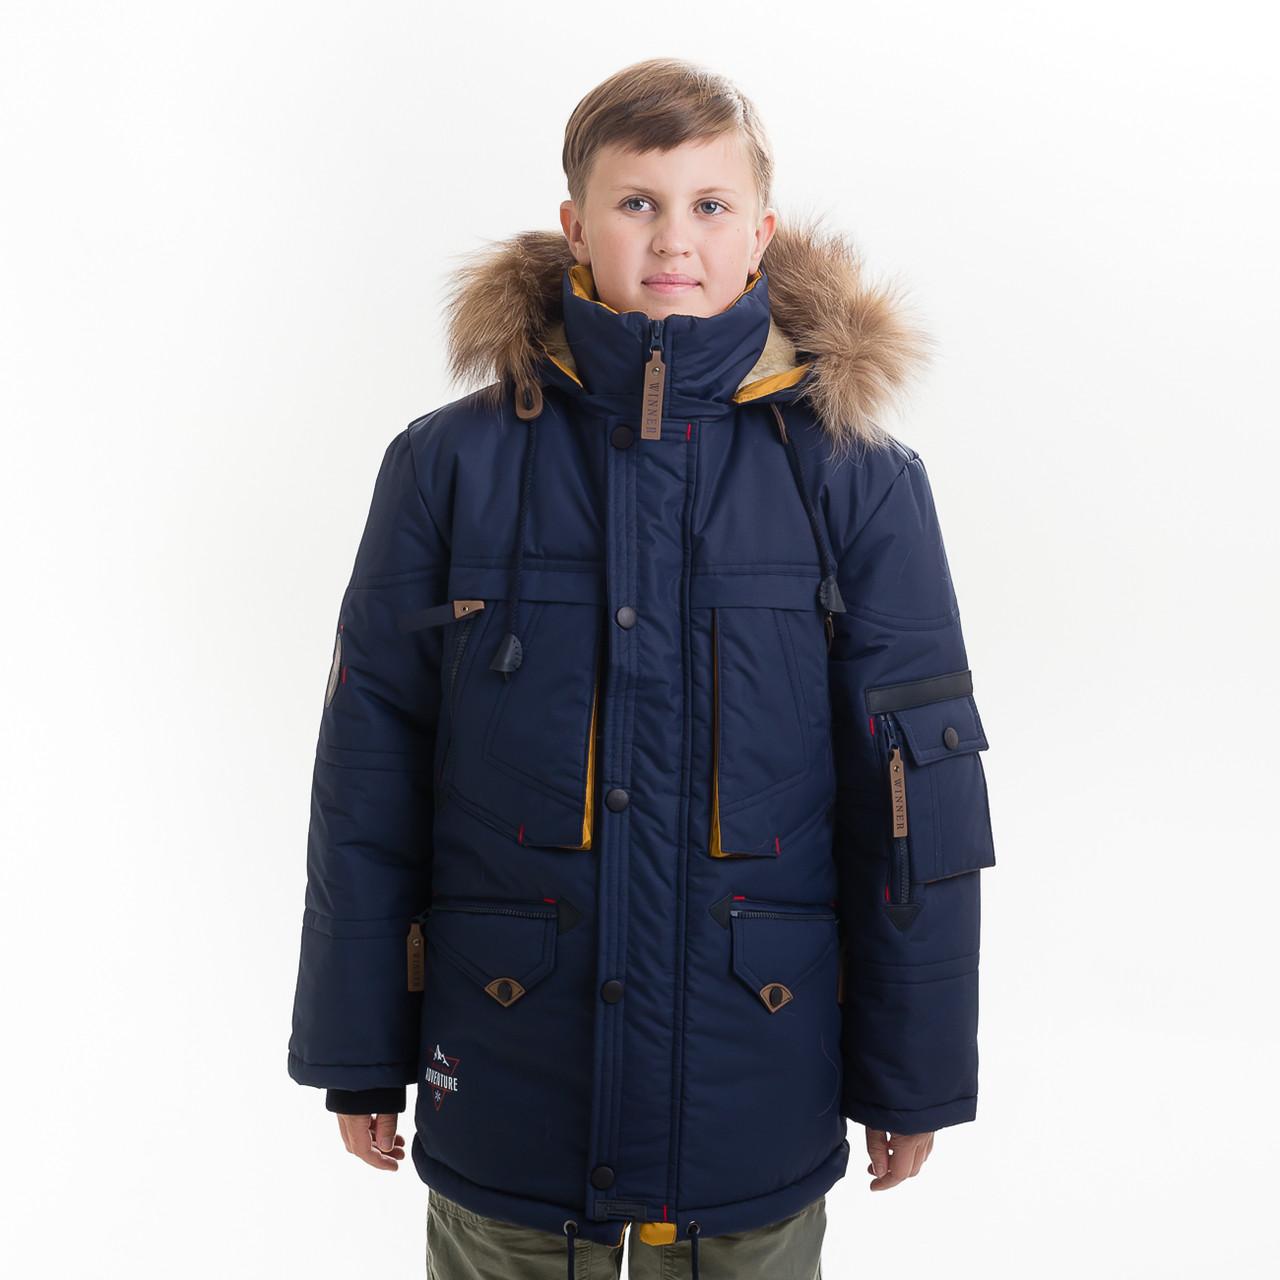 ddc19b10635 Детская зимняя куртка